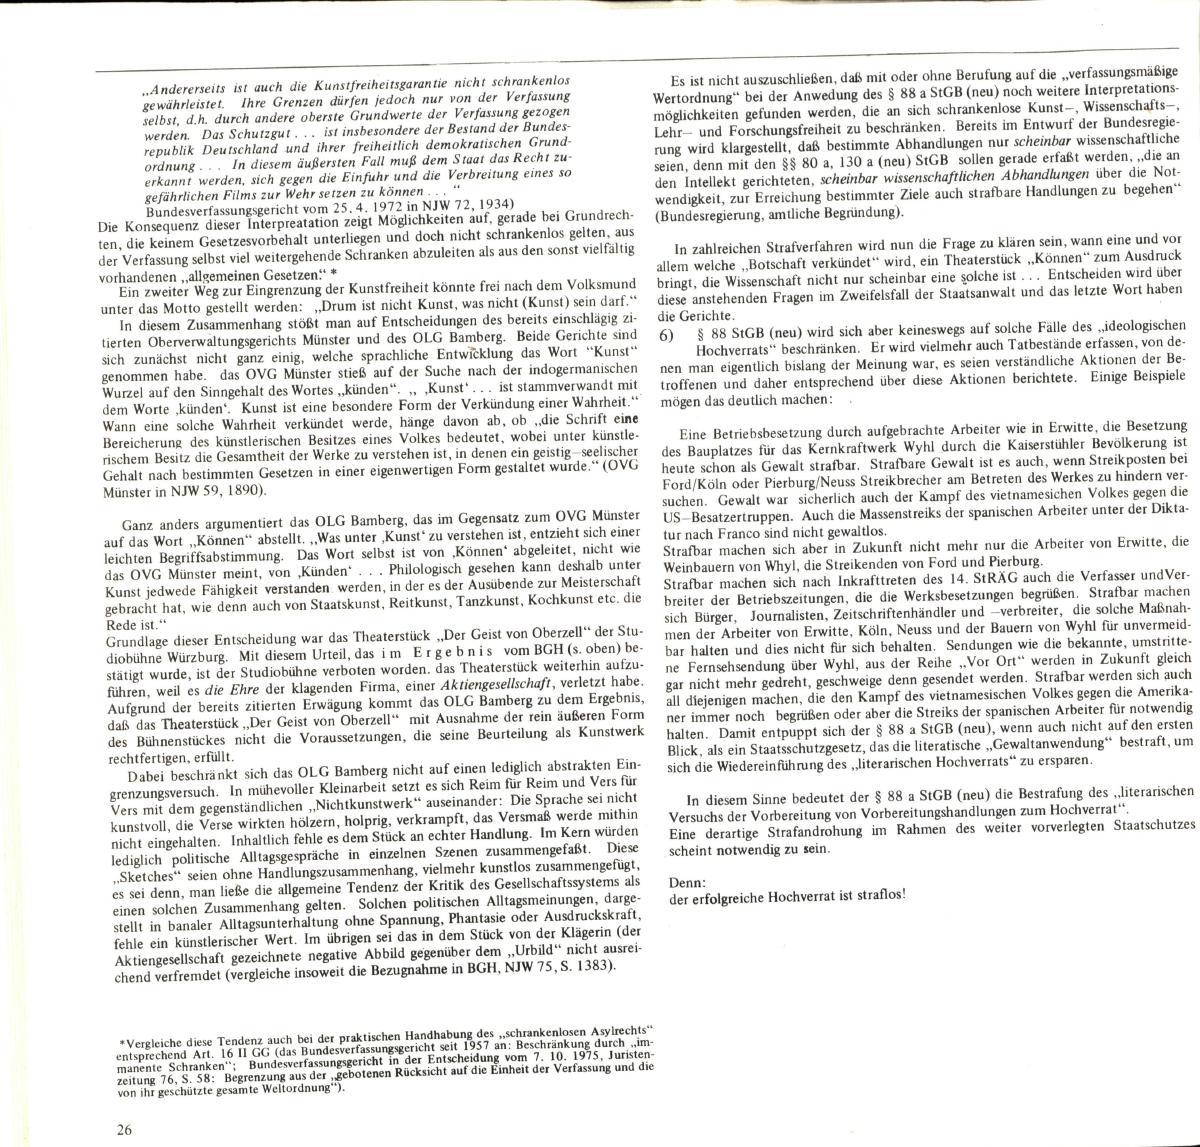 REP_VLB_1976_Die_Zensurgesetze_27